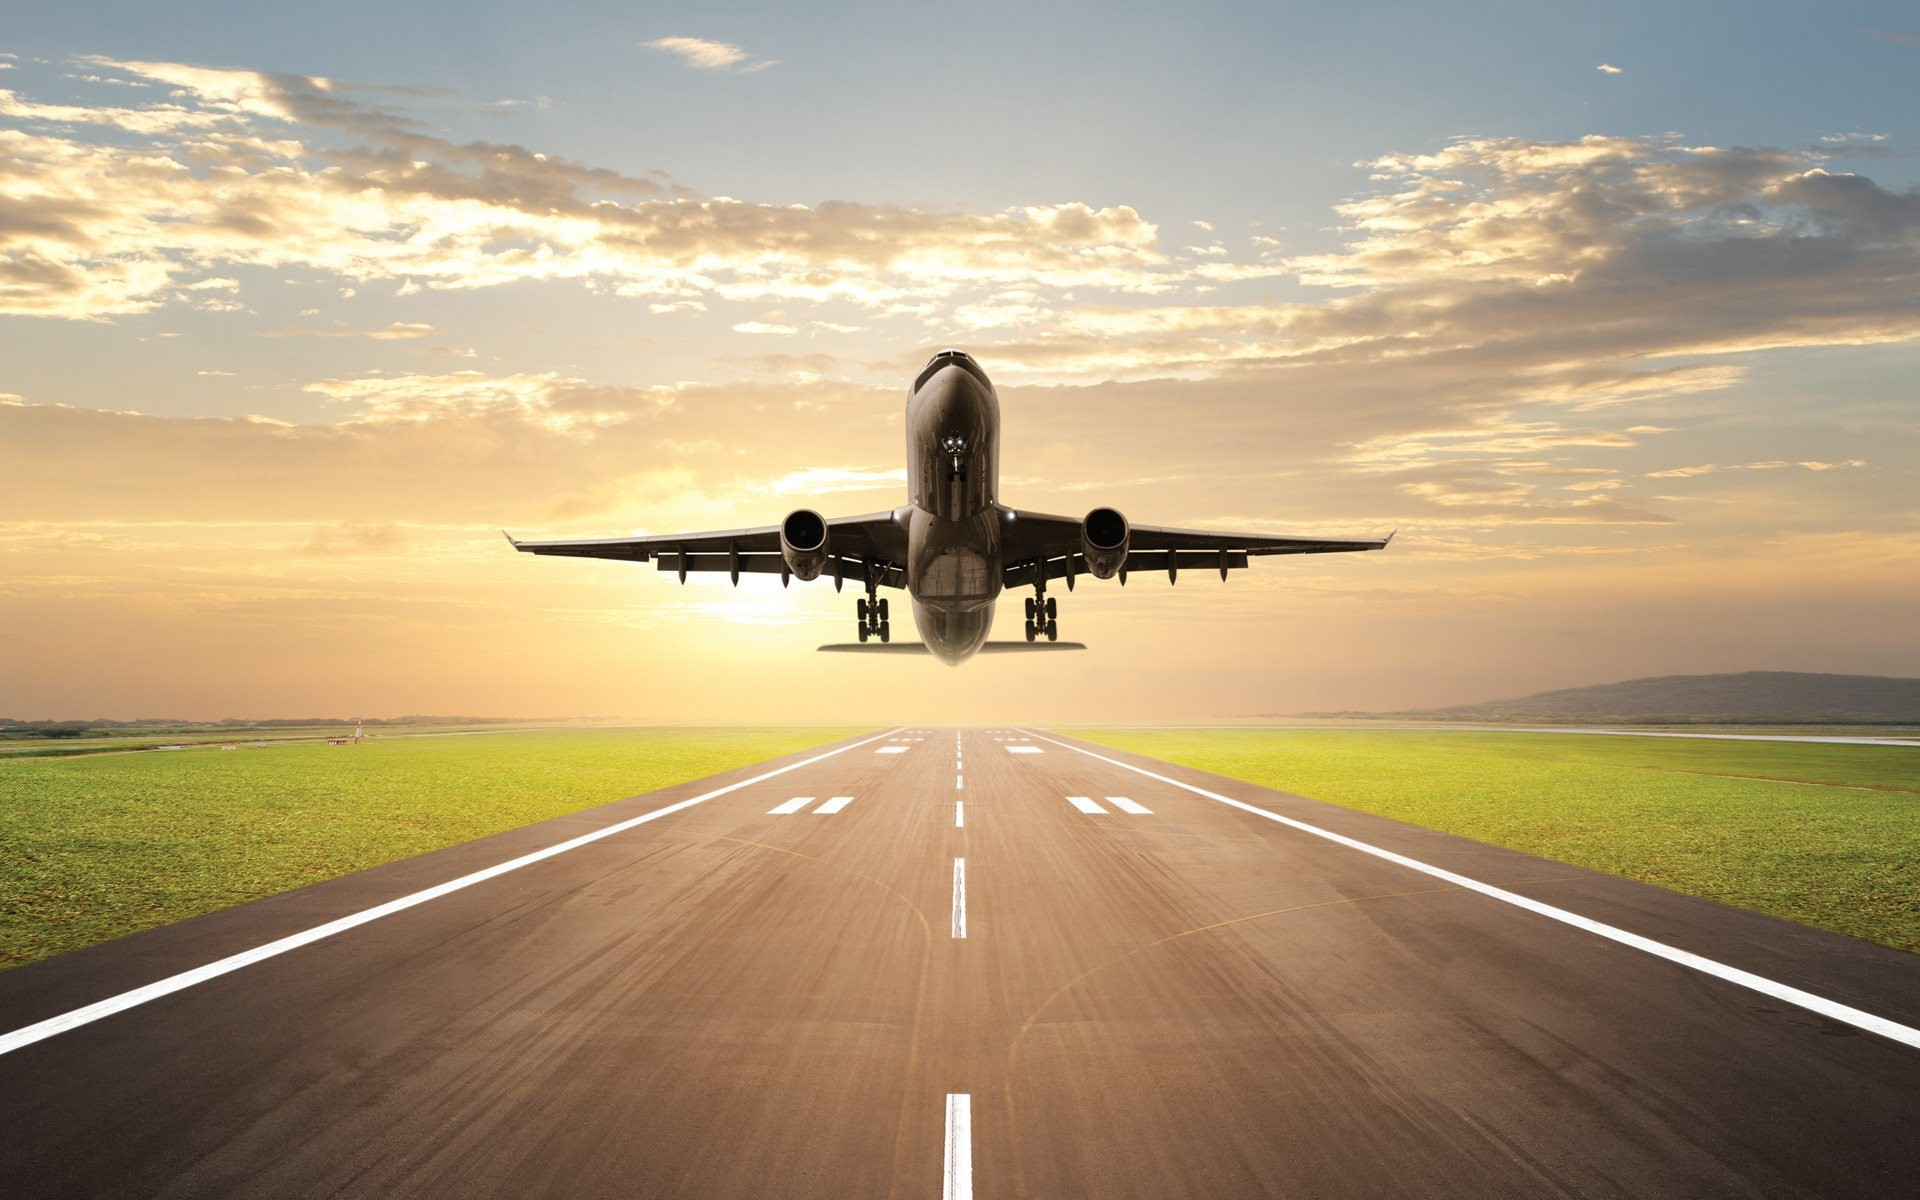 HD Wallpapers Flight Takeoff